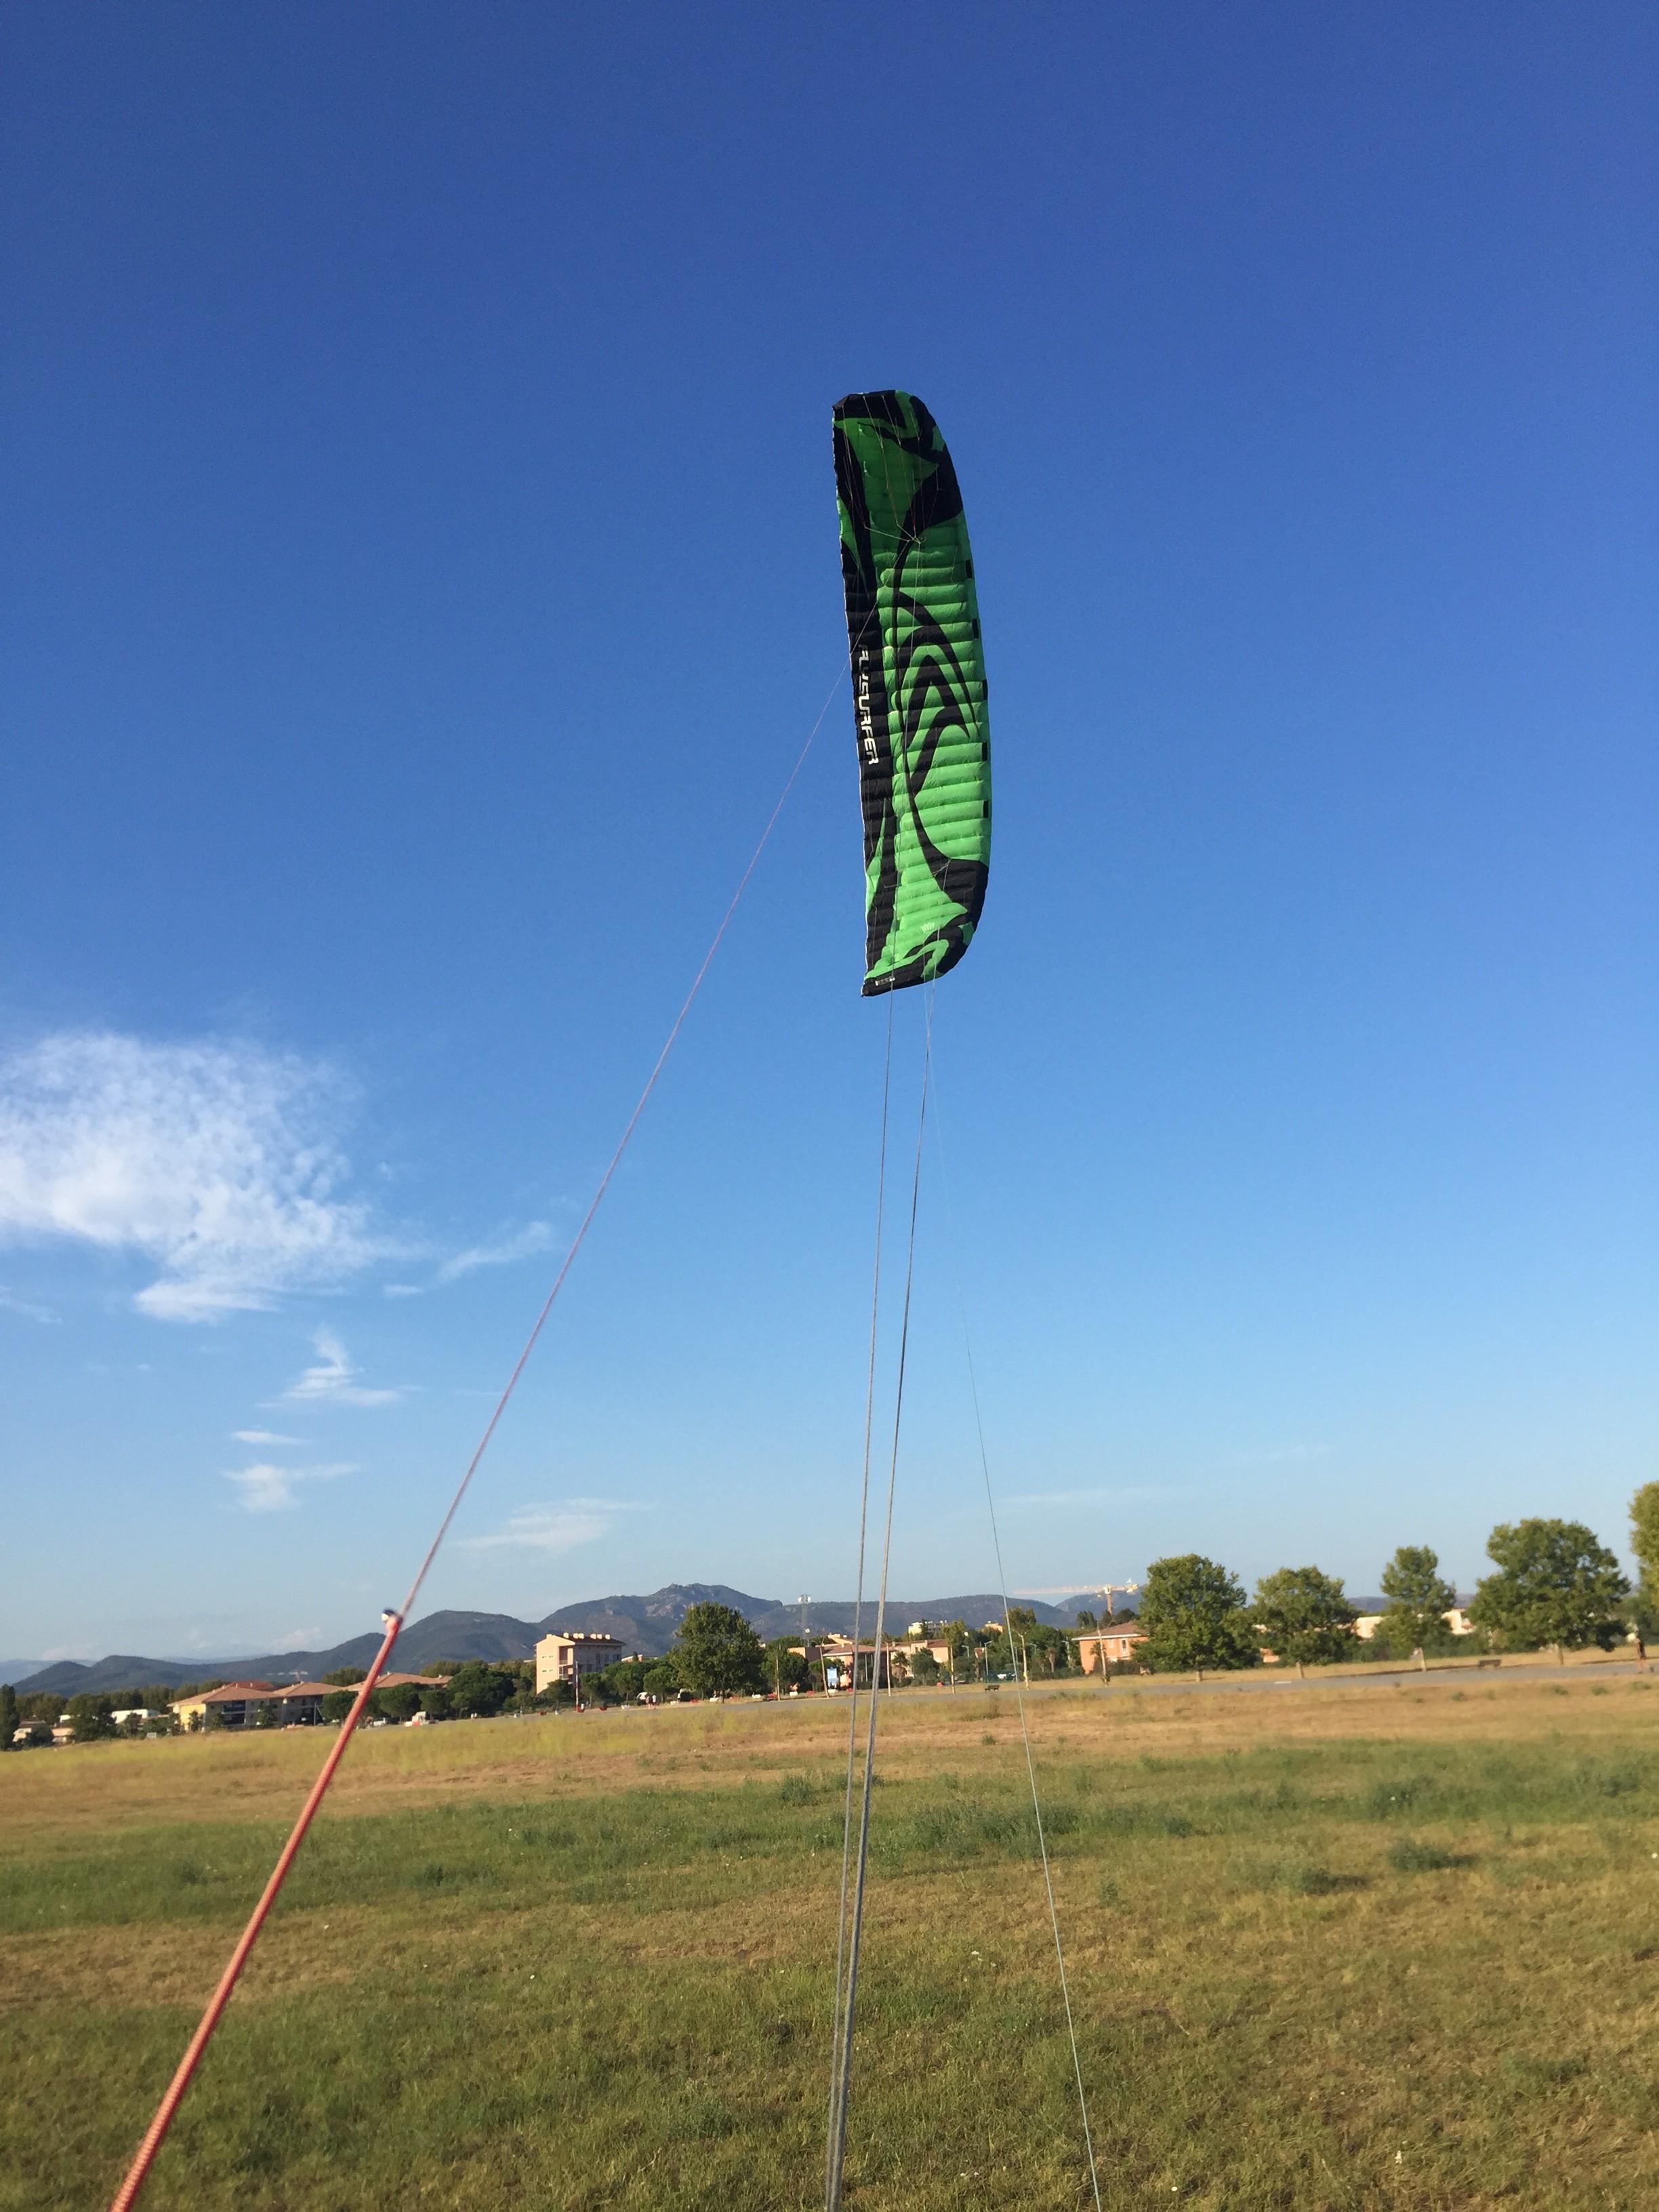 {VENDUE} Flysurfer speed3 green edition 19m2 700E Y7B7m7